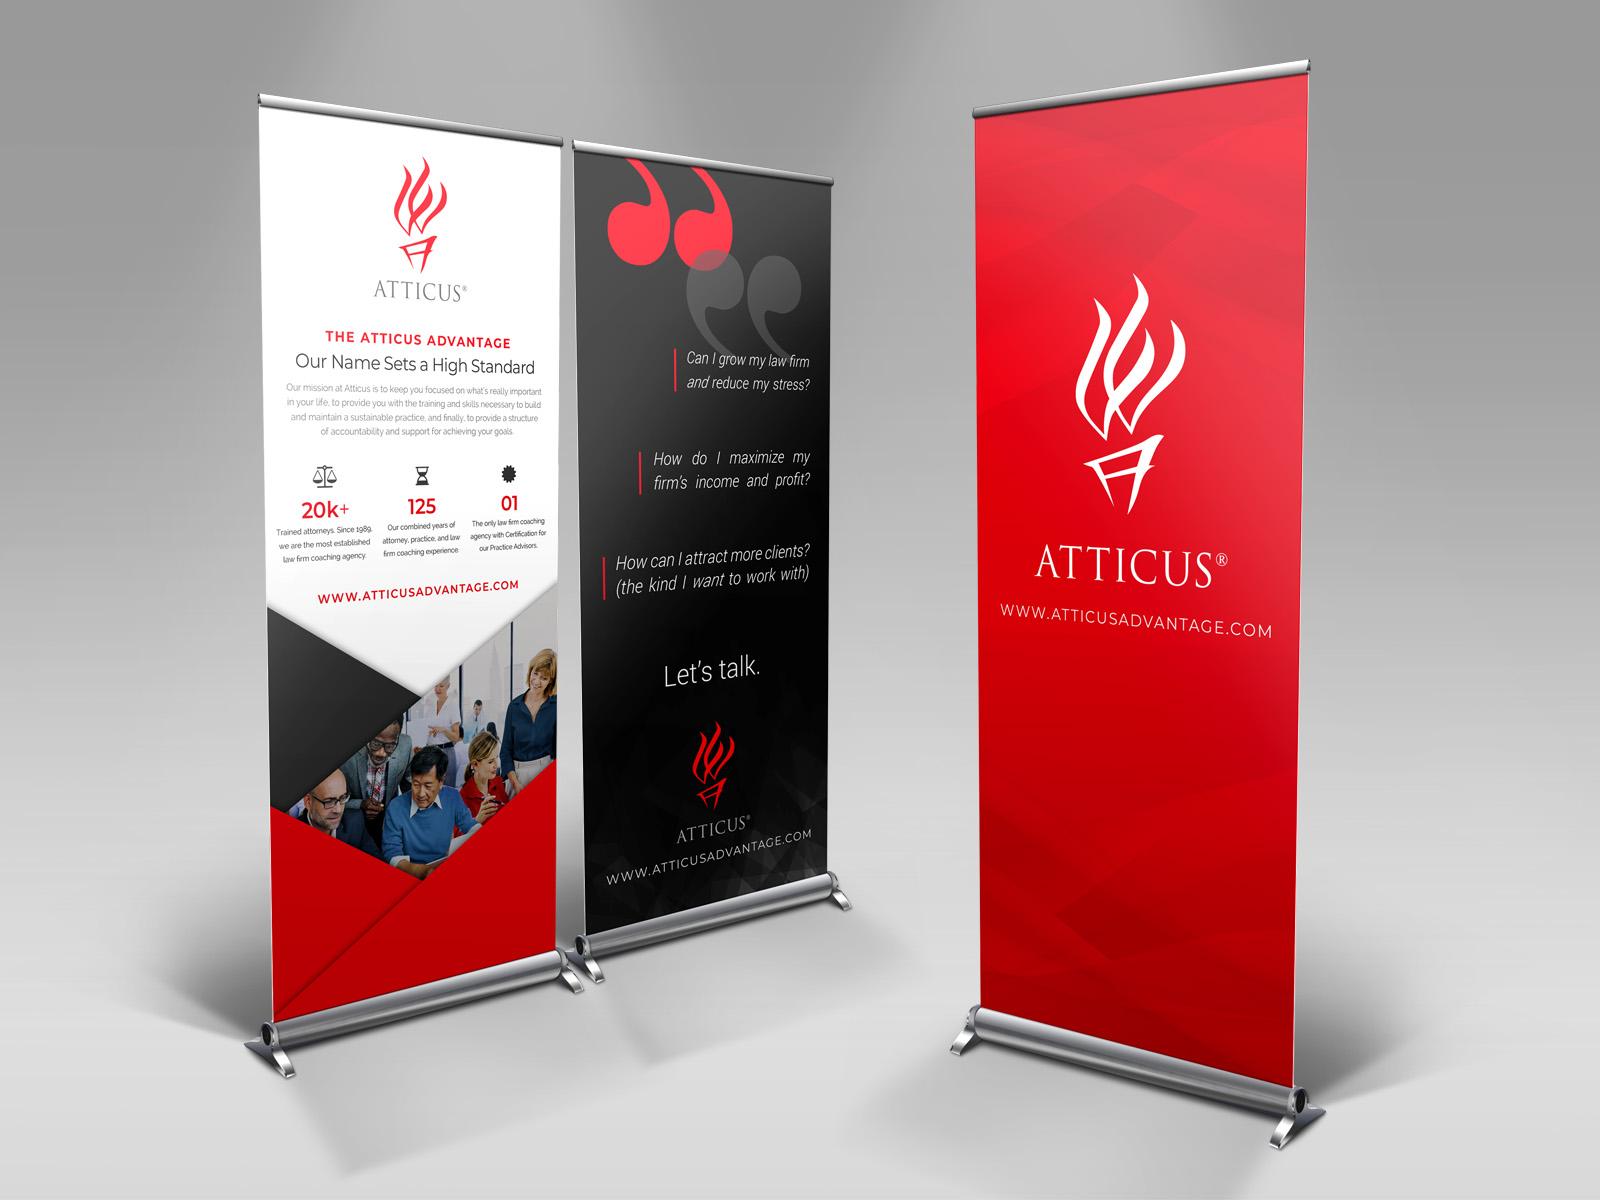 atticus-summit-tradeshow-banners